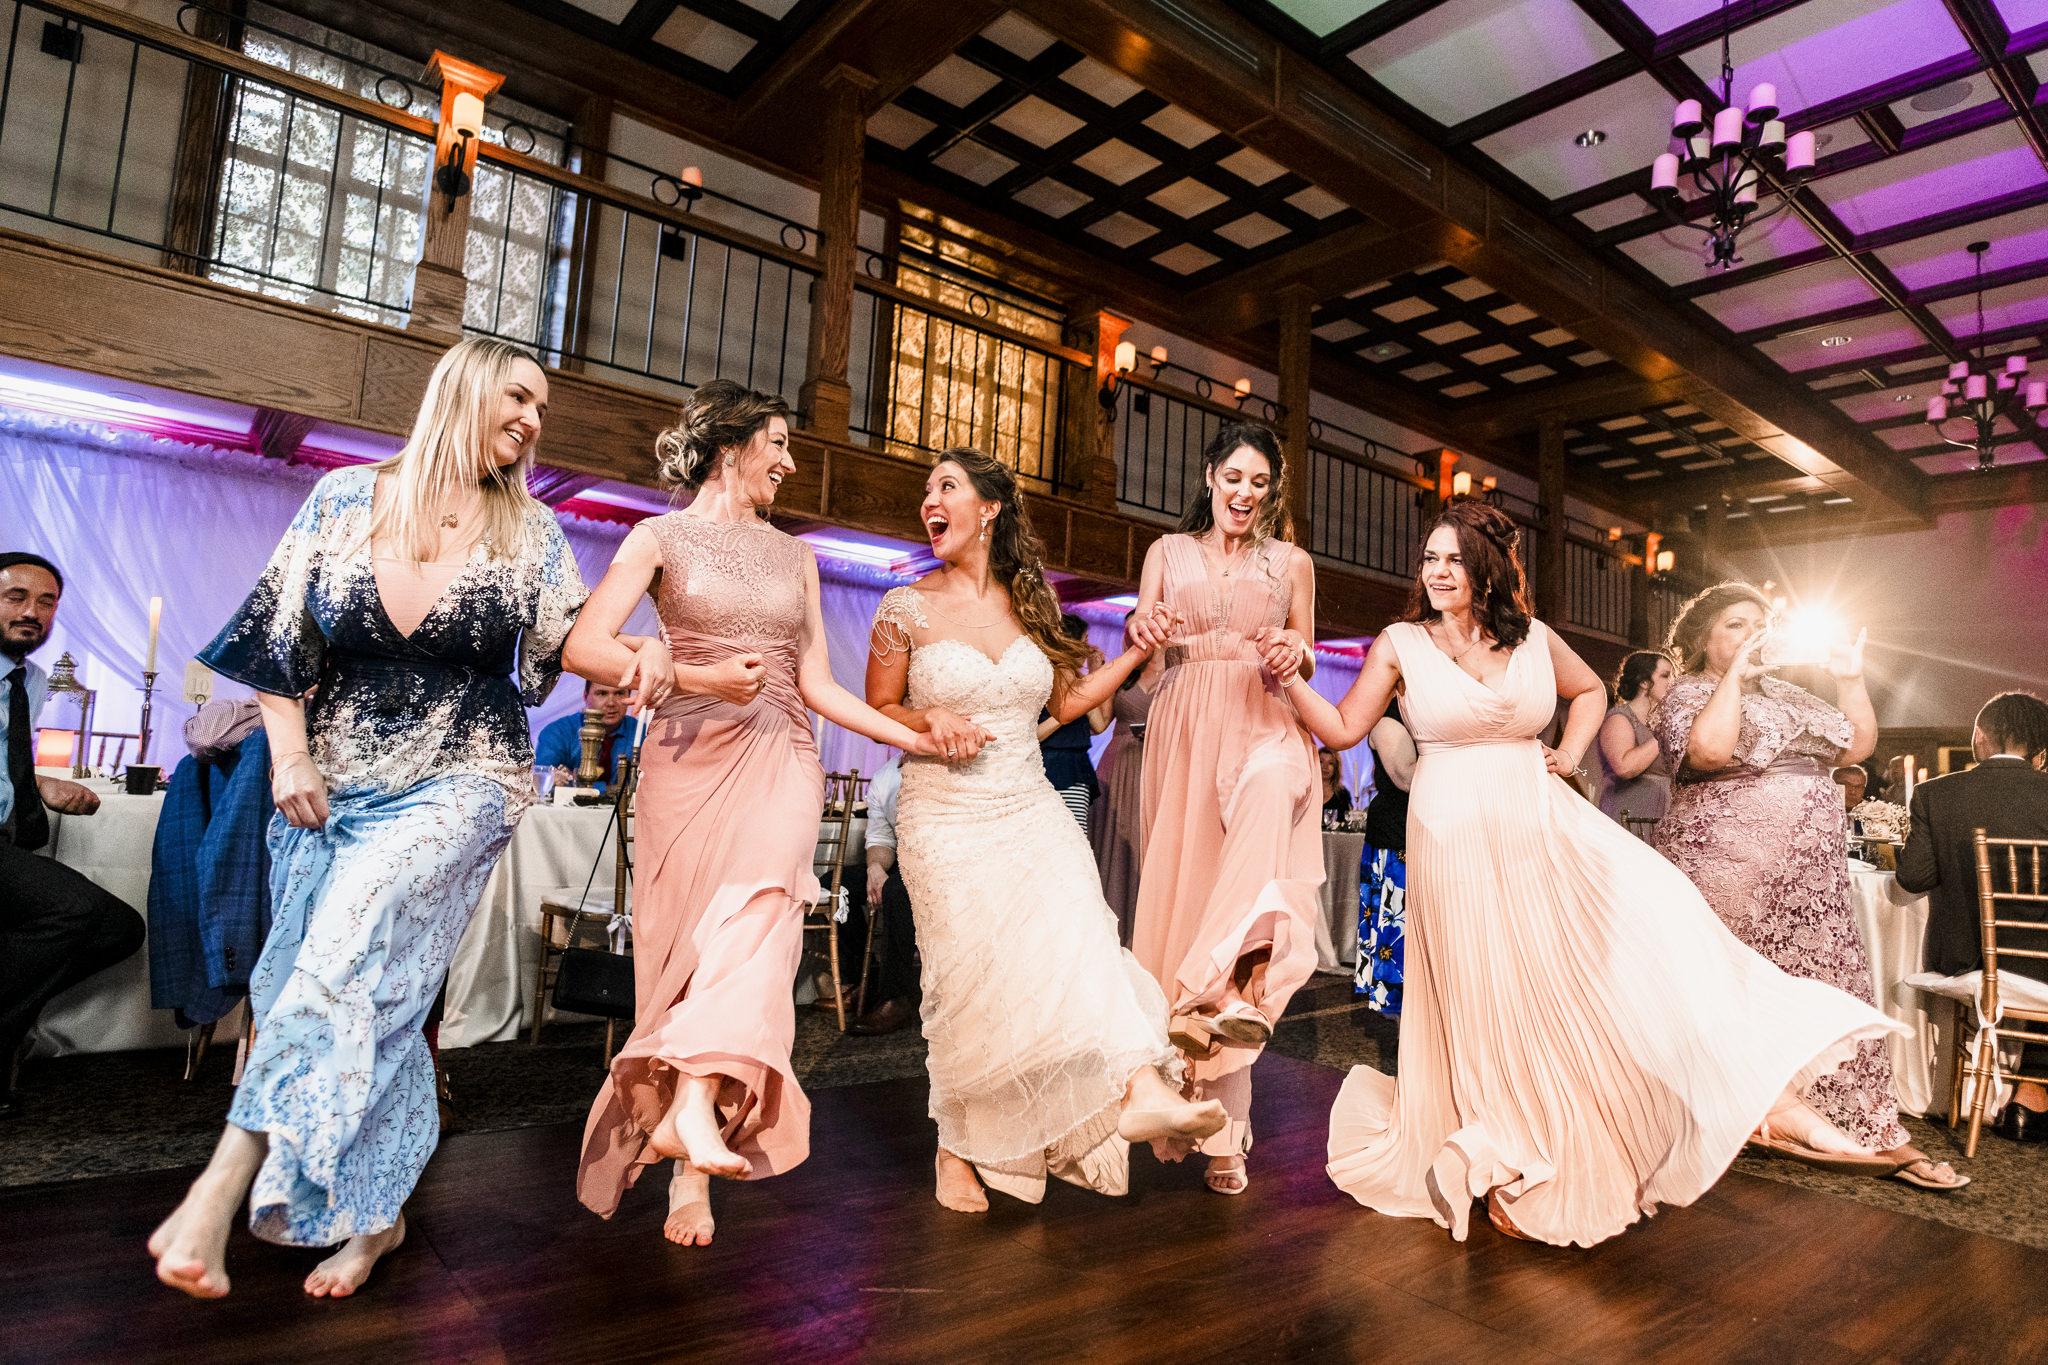 Barbato-Moorestown-Community-House-Wedding-New-Jersey-Photographer-39.JPG